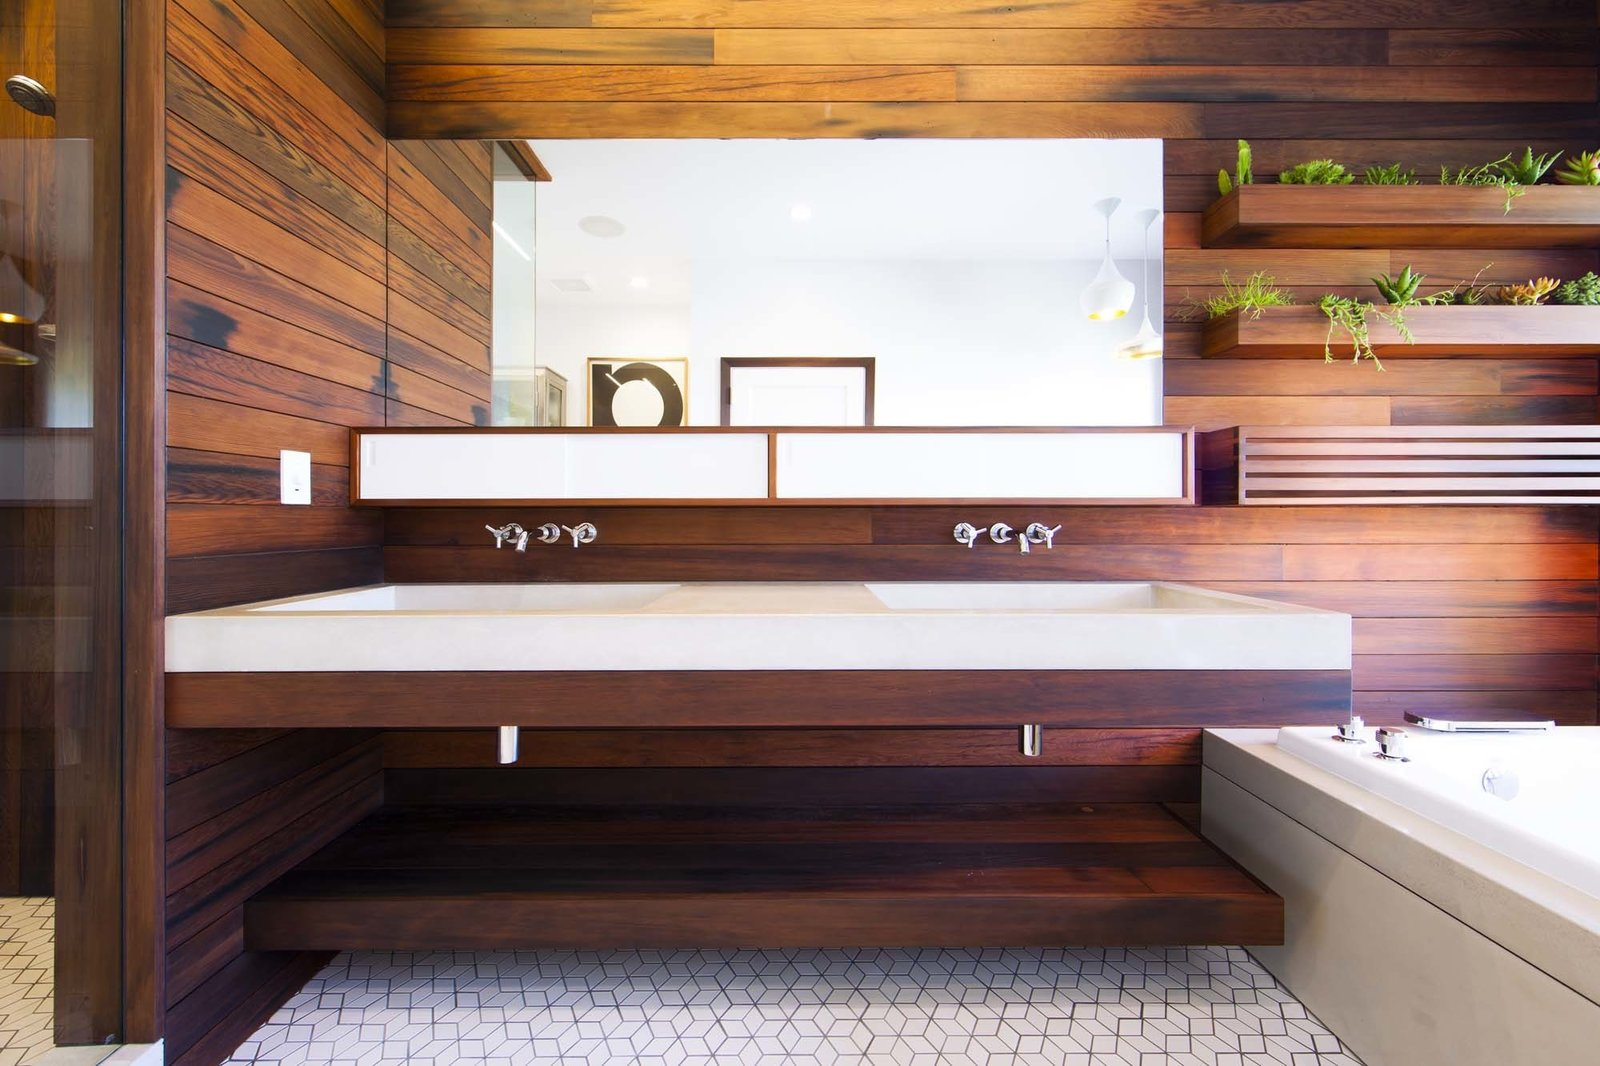 Photo Courtesy of Chris Brigham  Bathroom Ideas by Tom Berna from Bath & Spa Intrigue